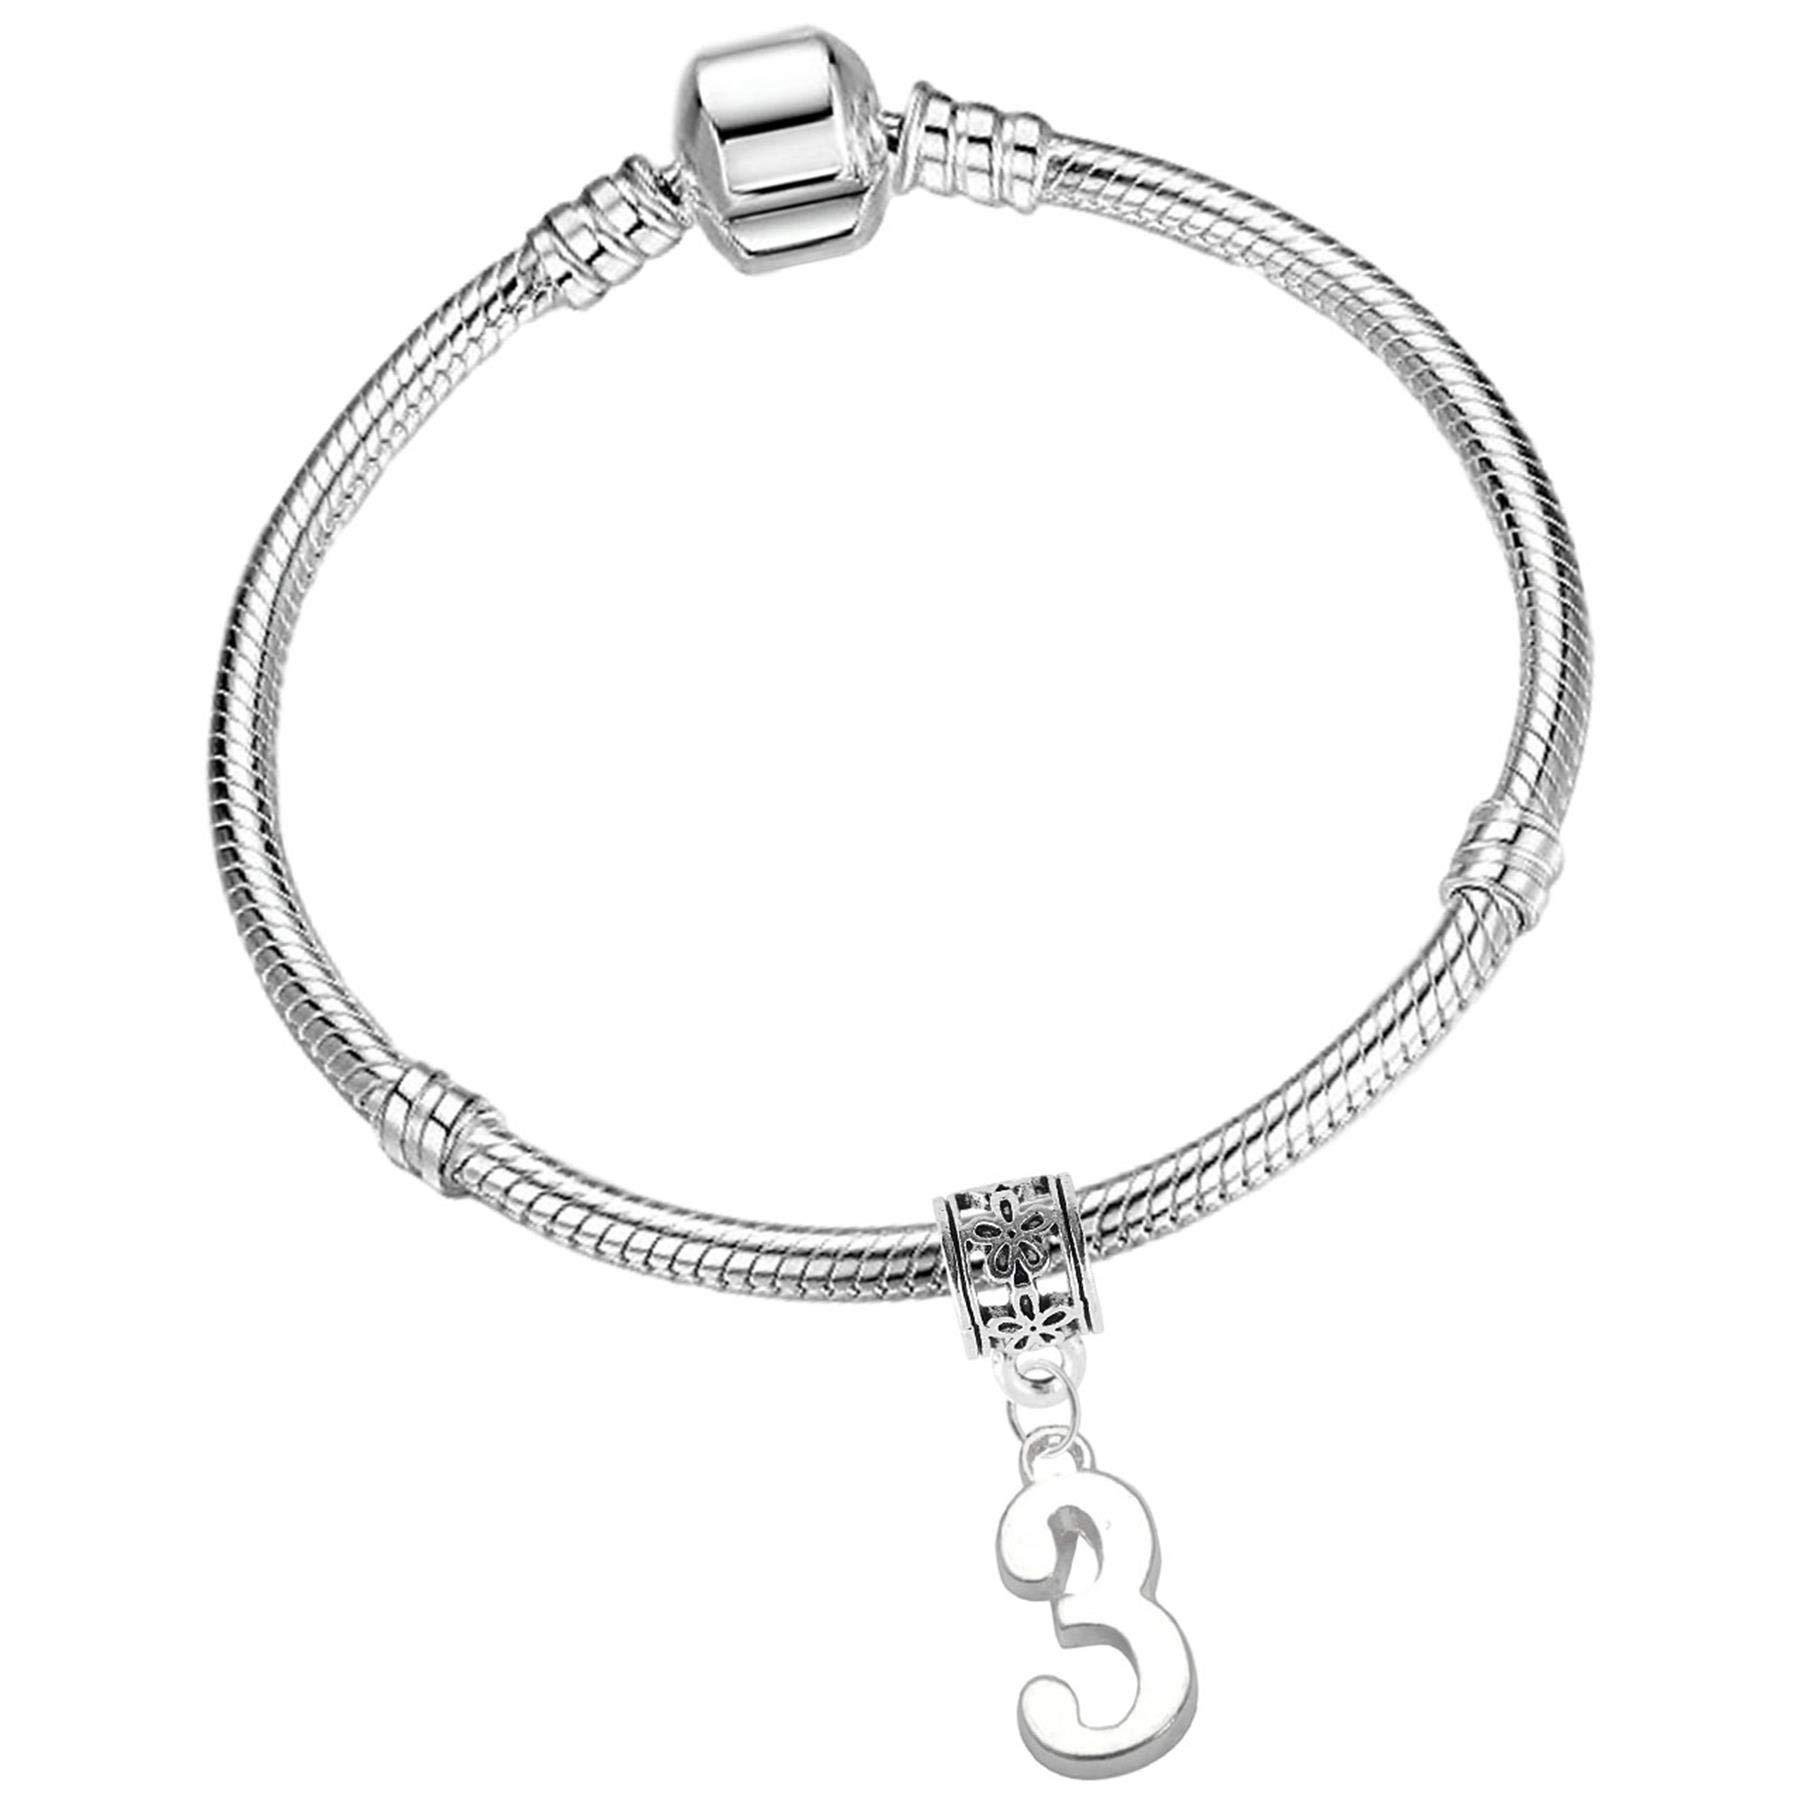 Girls Birthday Starter Charm Bracelet with Gift Box Ages 3rd 4th 5th 6th 7th 8th 9th 10th 11th 12th 13th Birthday Gifts for Girls